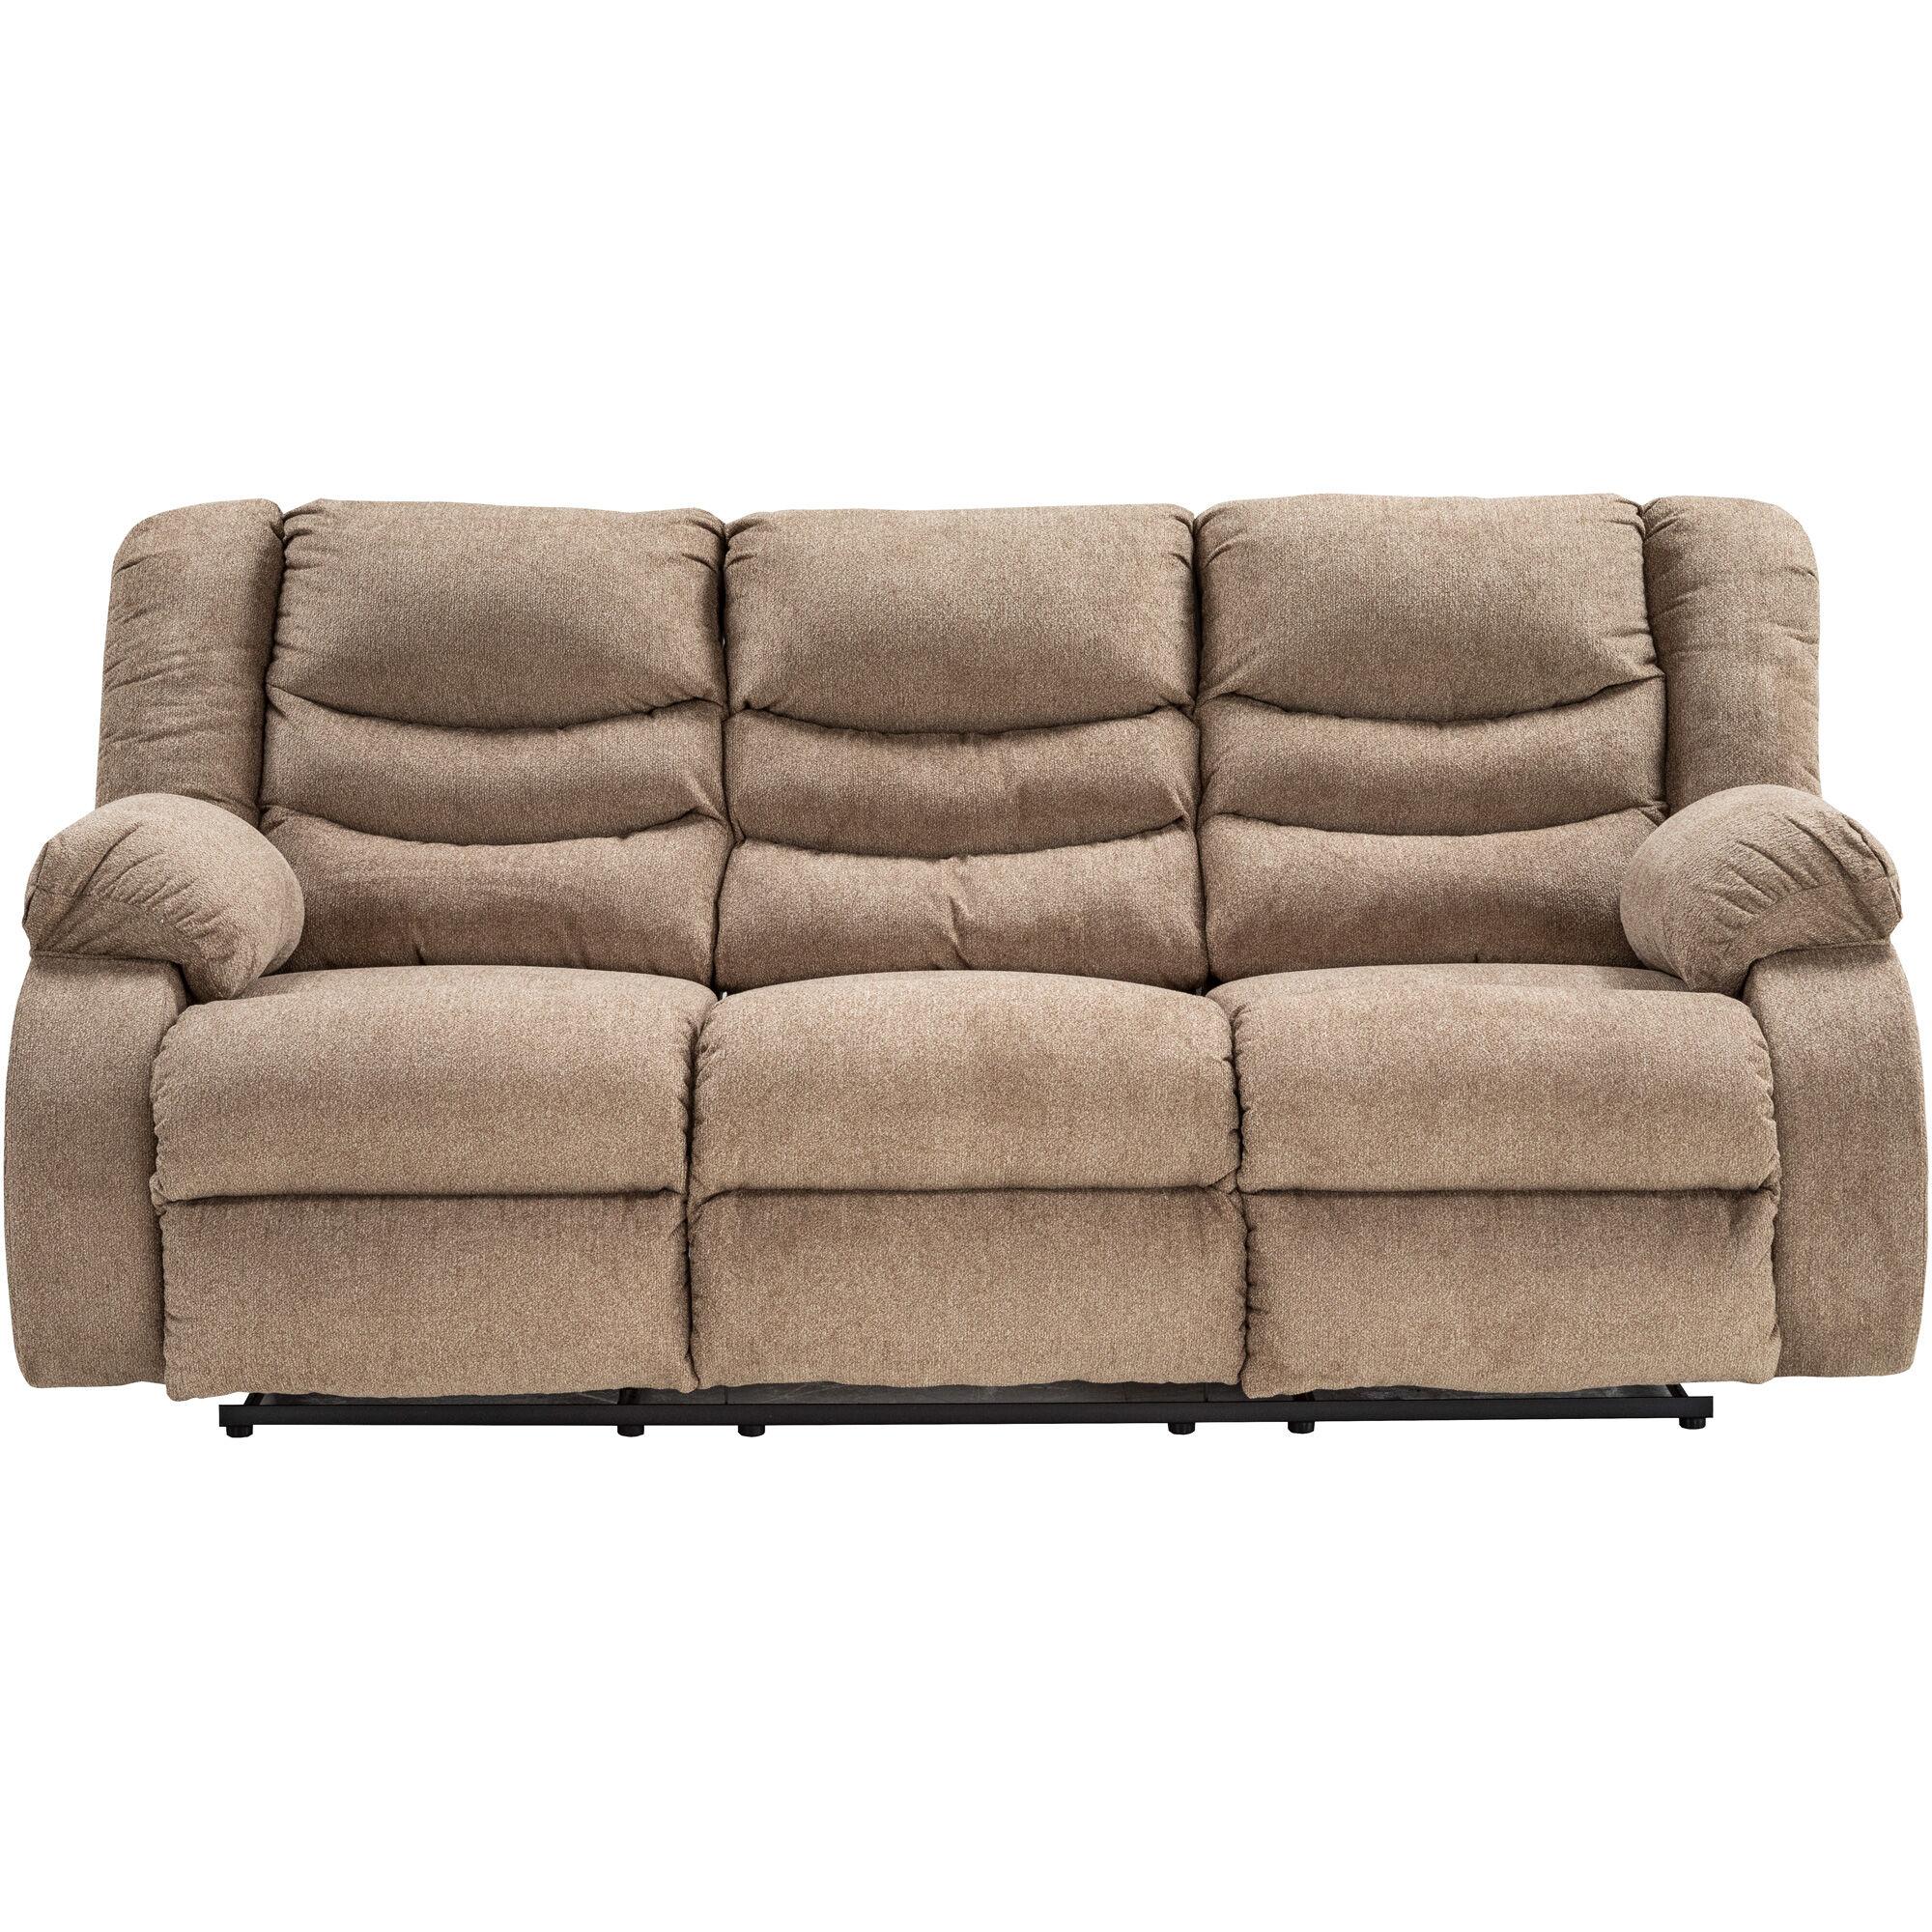 slumberland sofa recliners mitc gold sleeper bloomingdales com furniture